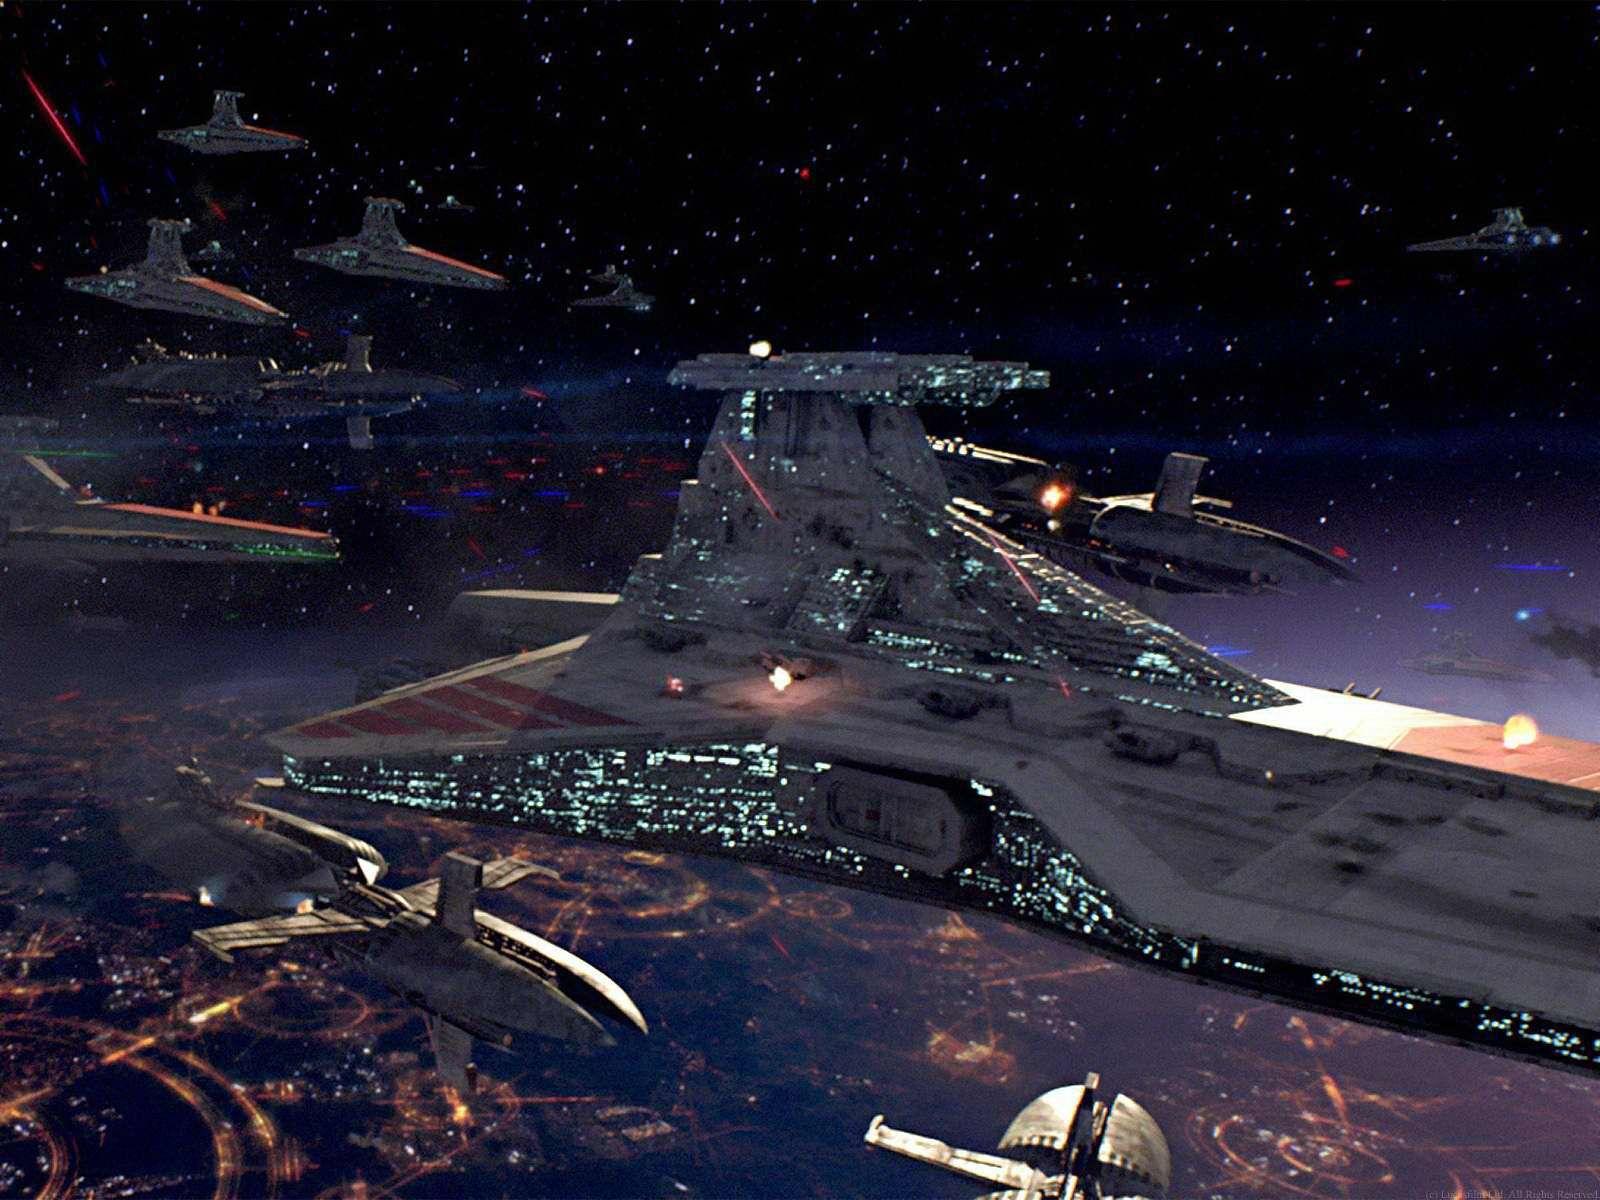 Venator class ship over Coruscant Star wars spaceships